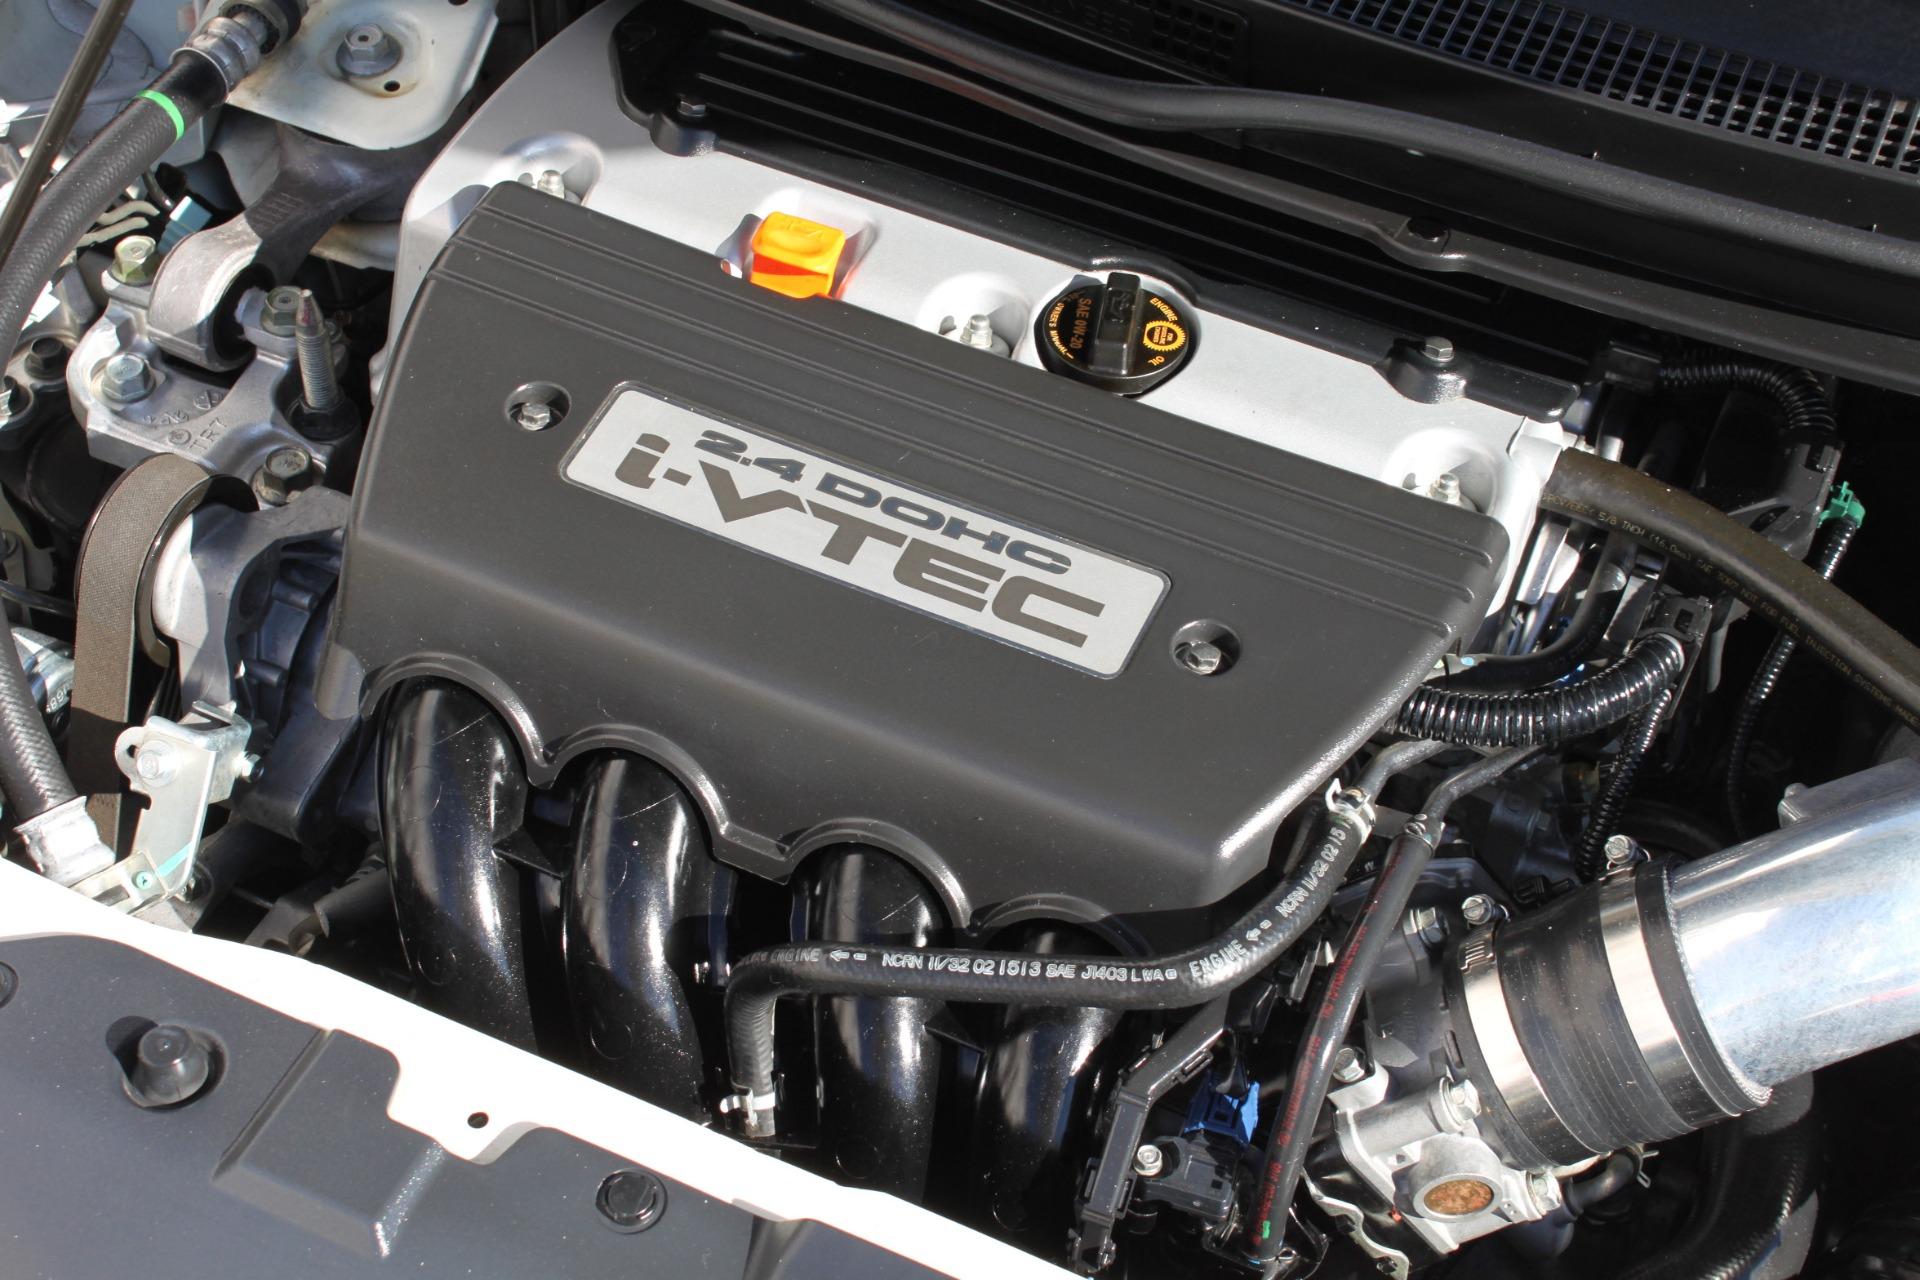 Used-2013-Honda-Civic-Sedan-Si-Land-Cruiser